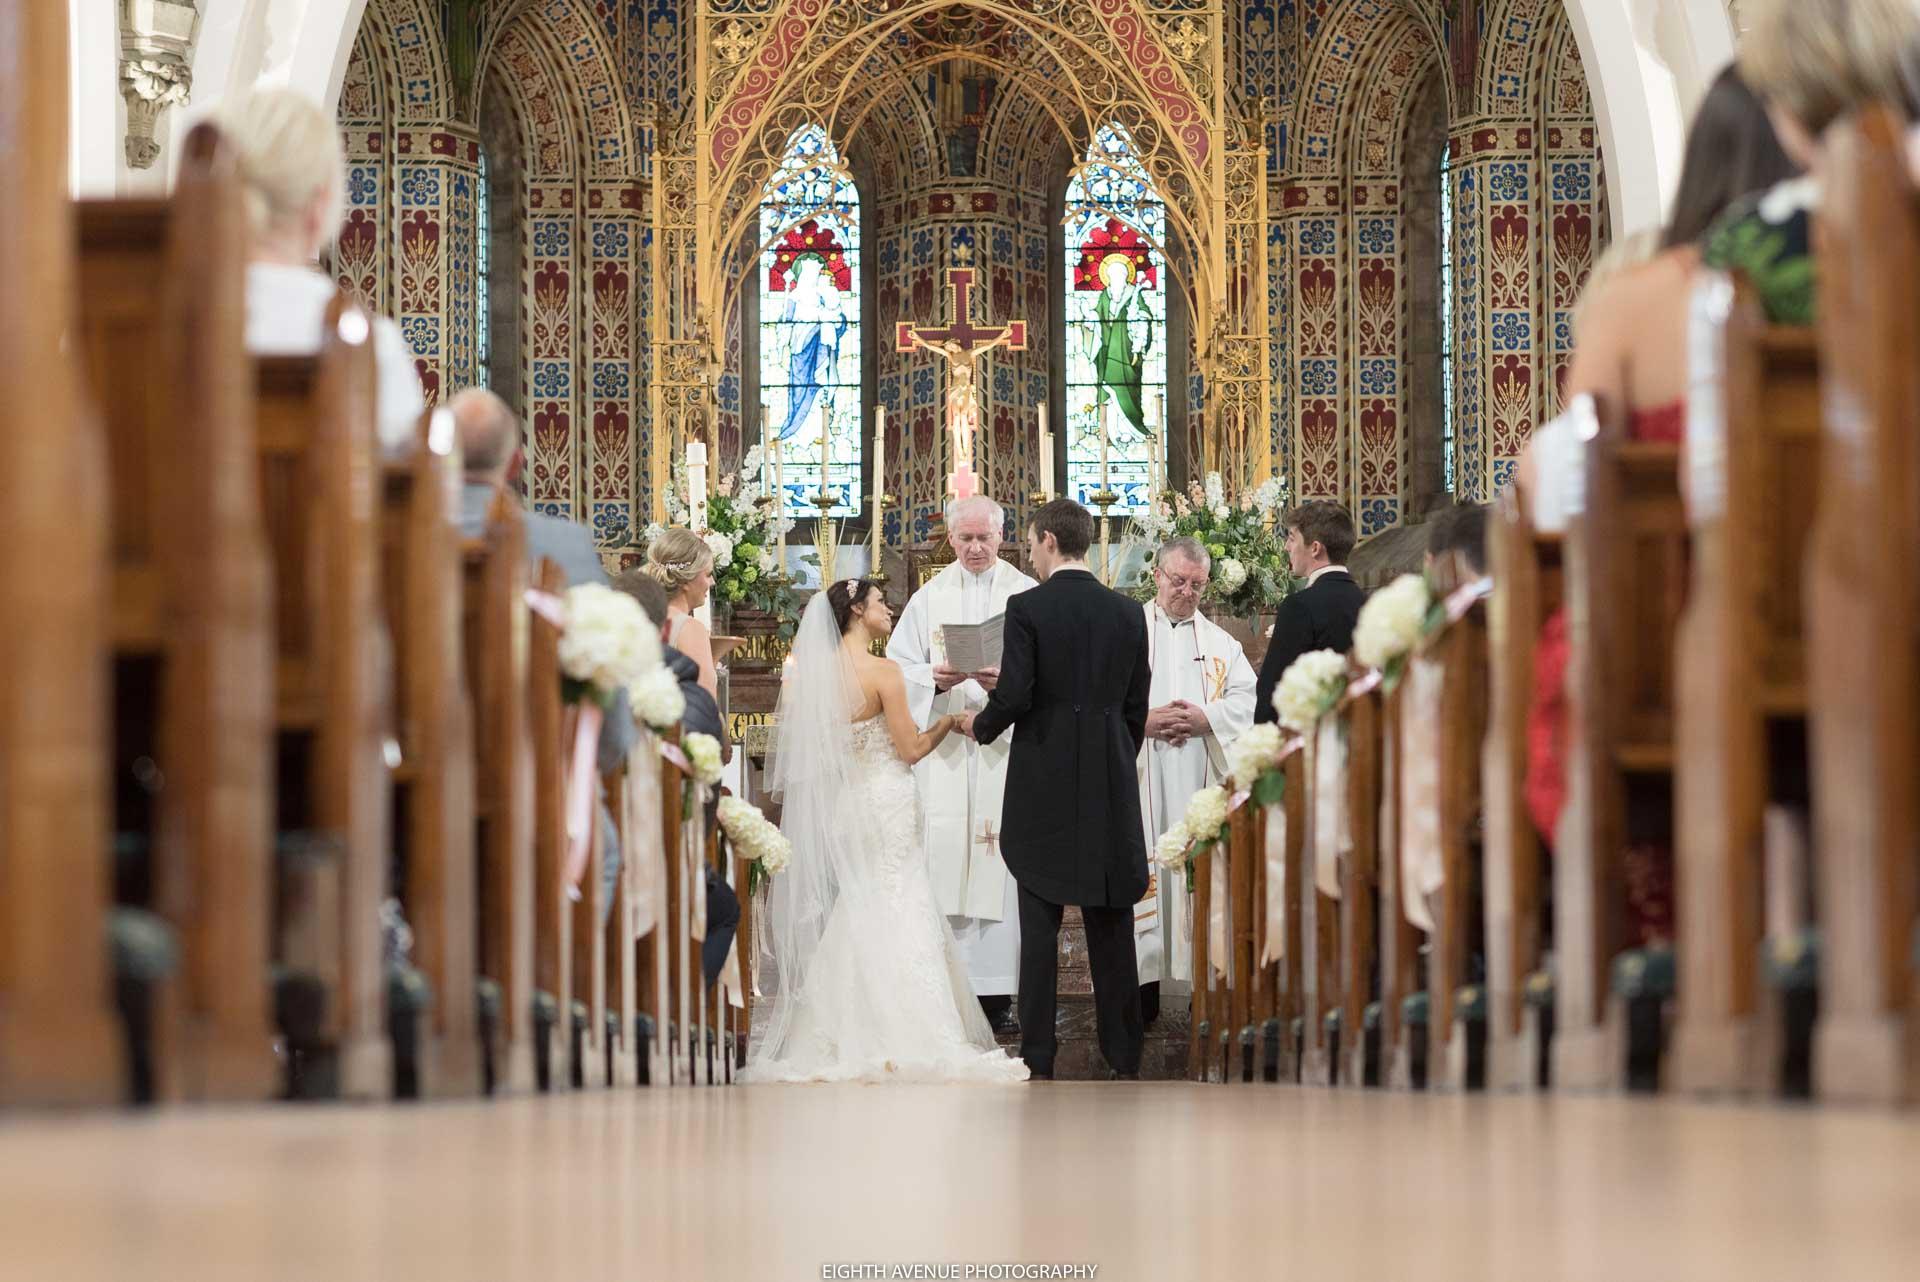 Bride and groom at church wedding